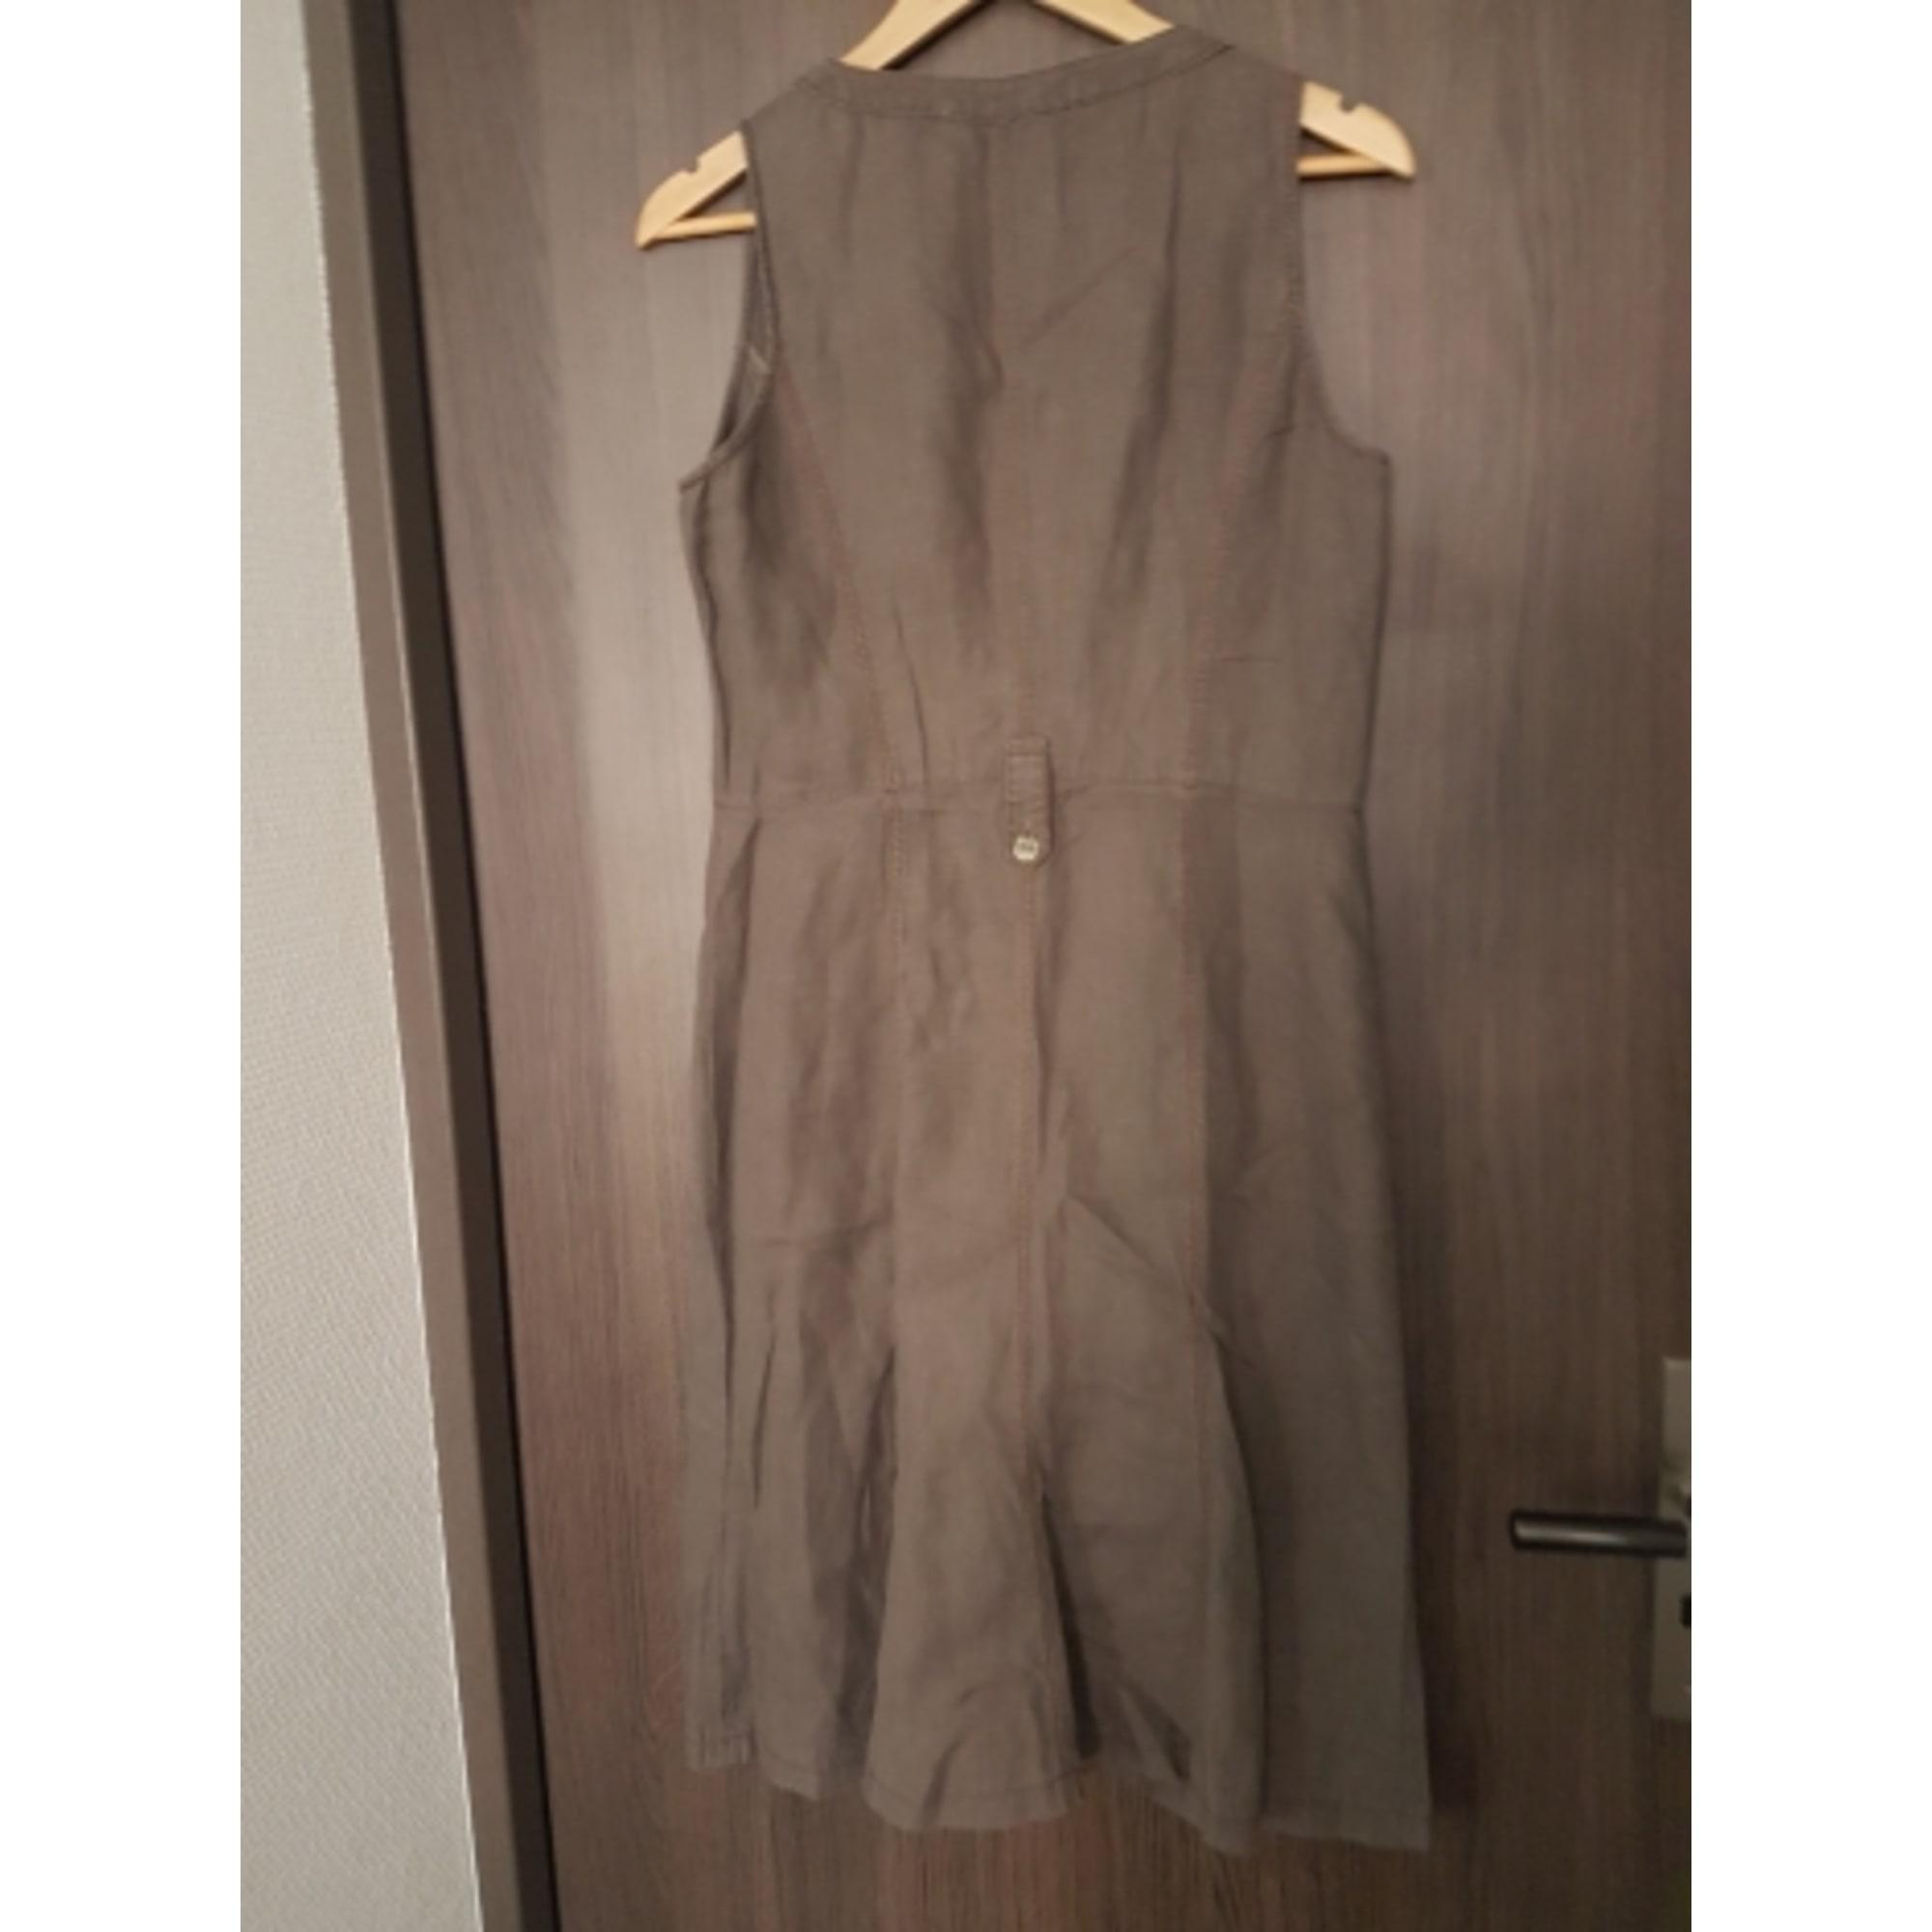 Robe longue GERARD DAREL Gris, anthracite